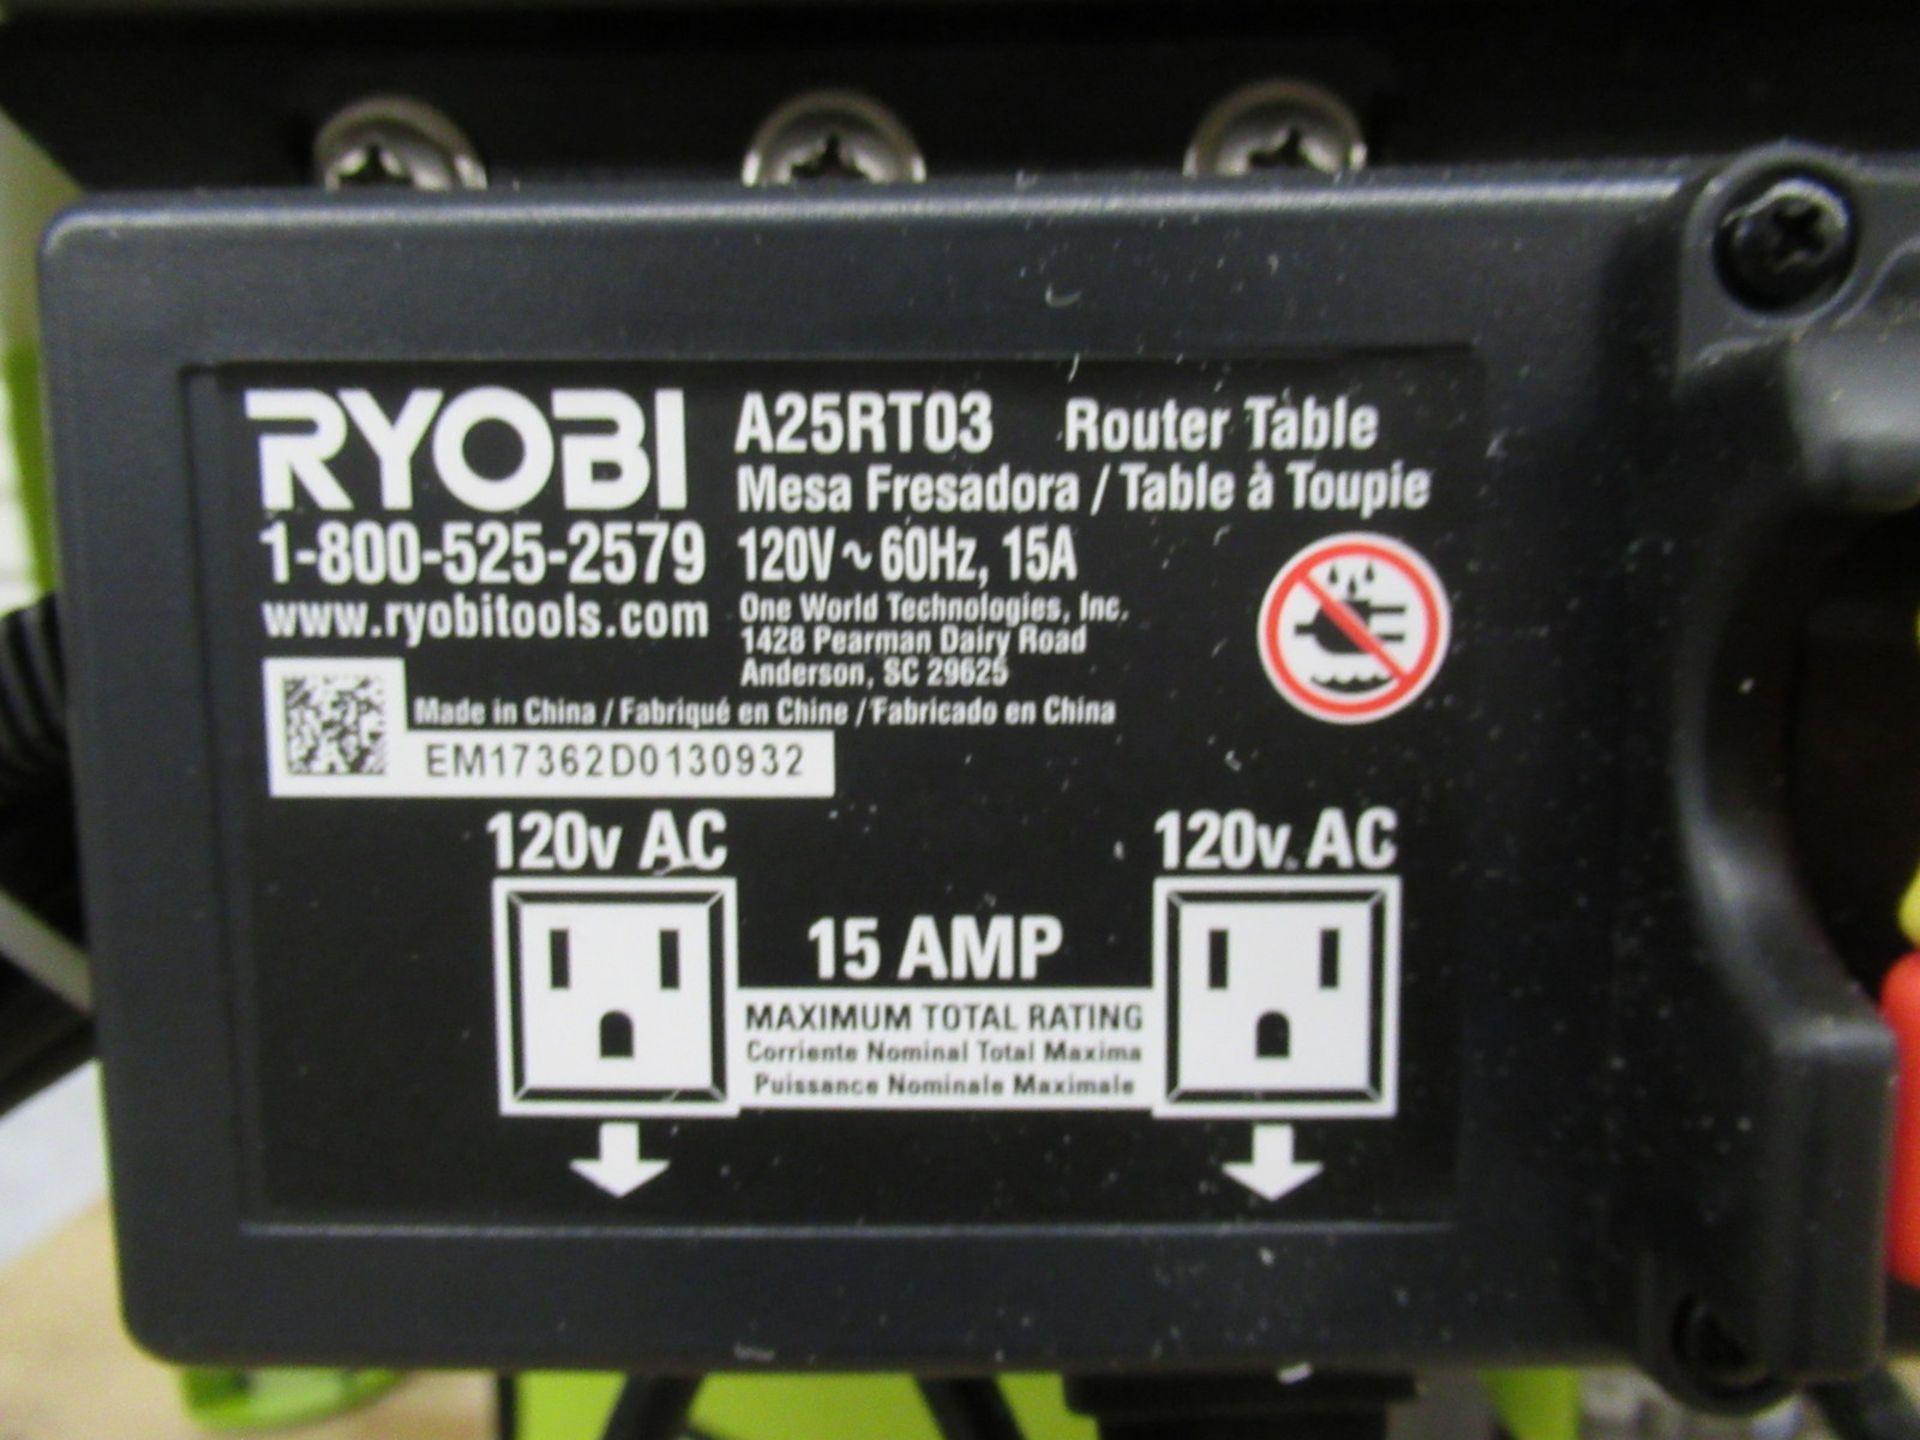 Lot 226 - Ryobi A25SRT03 Router Table